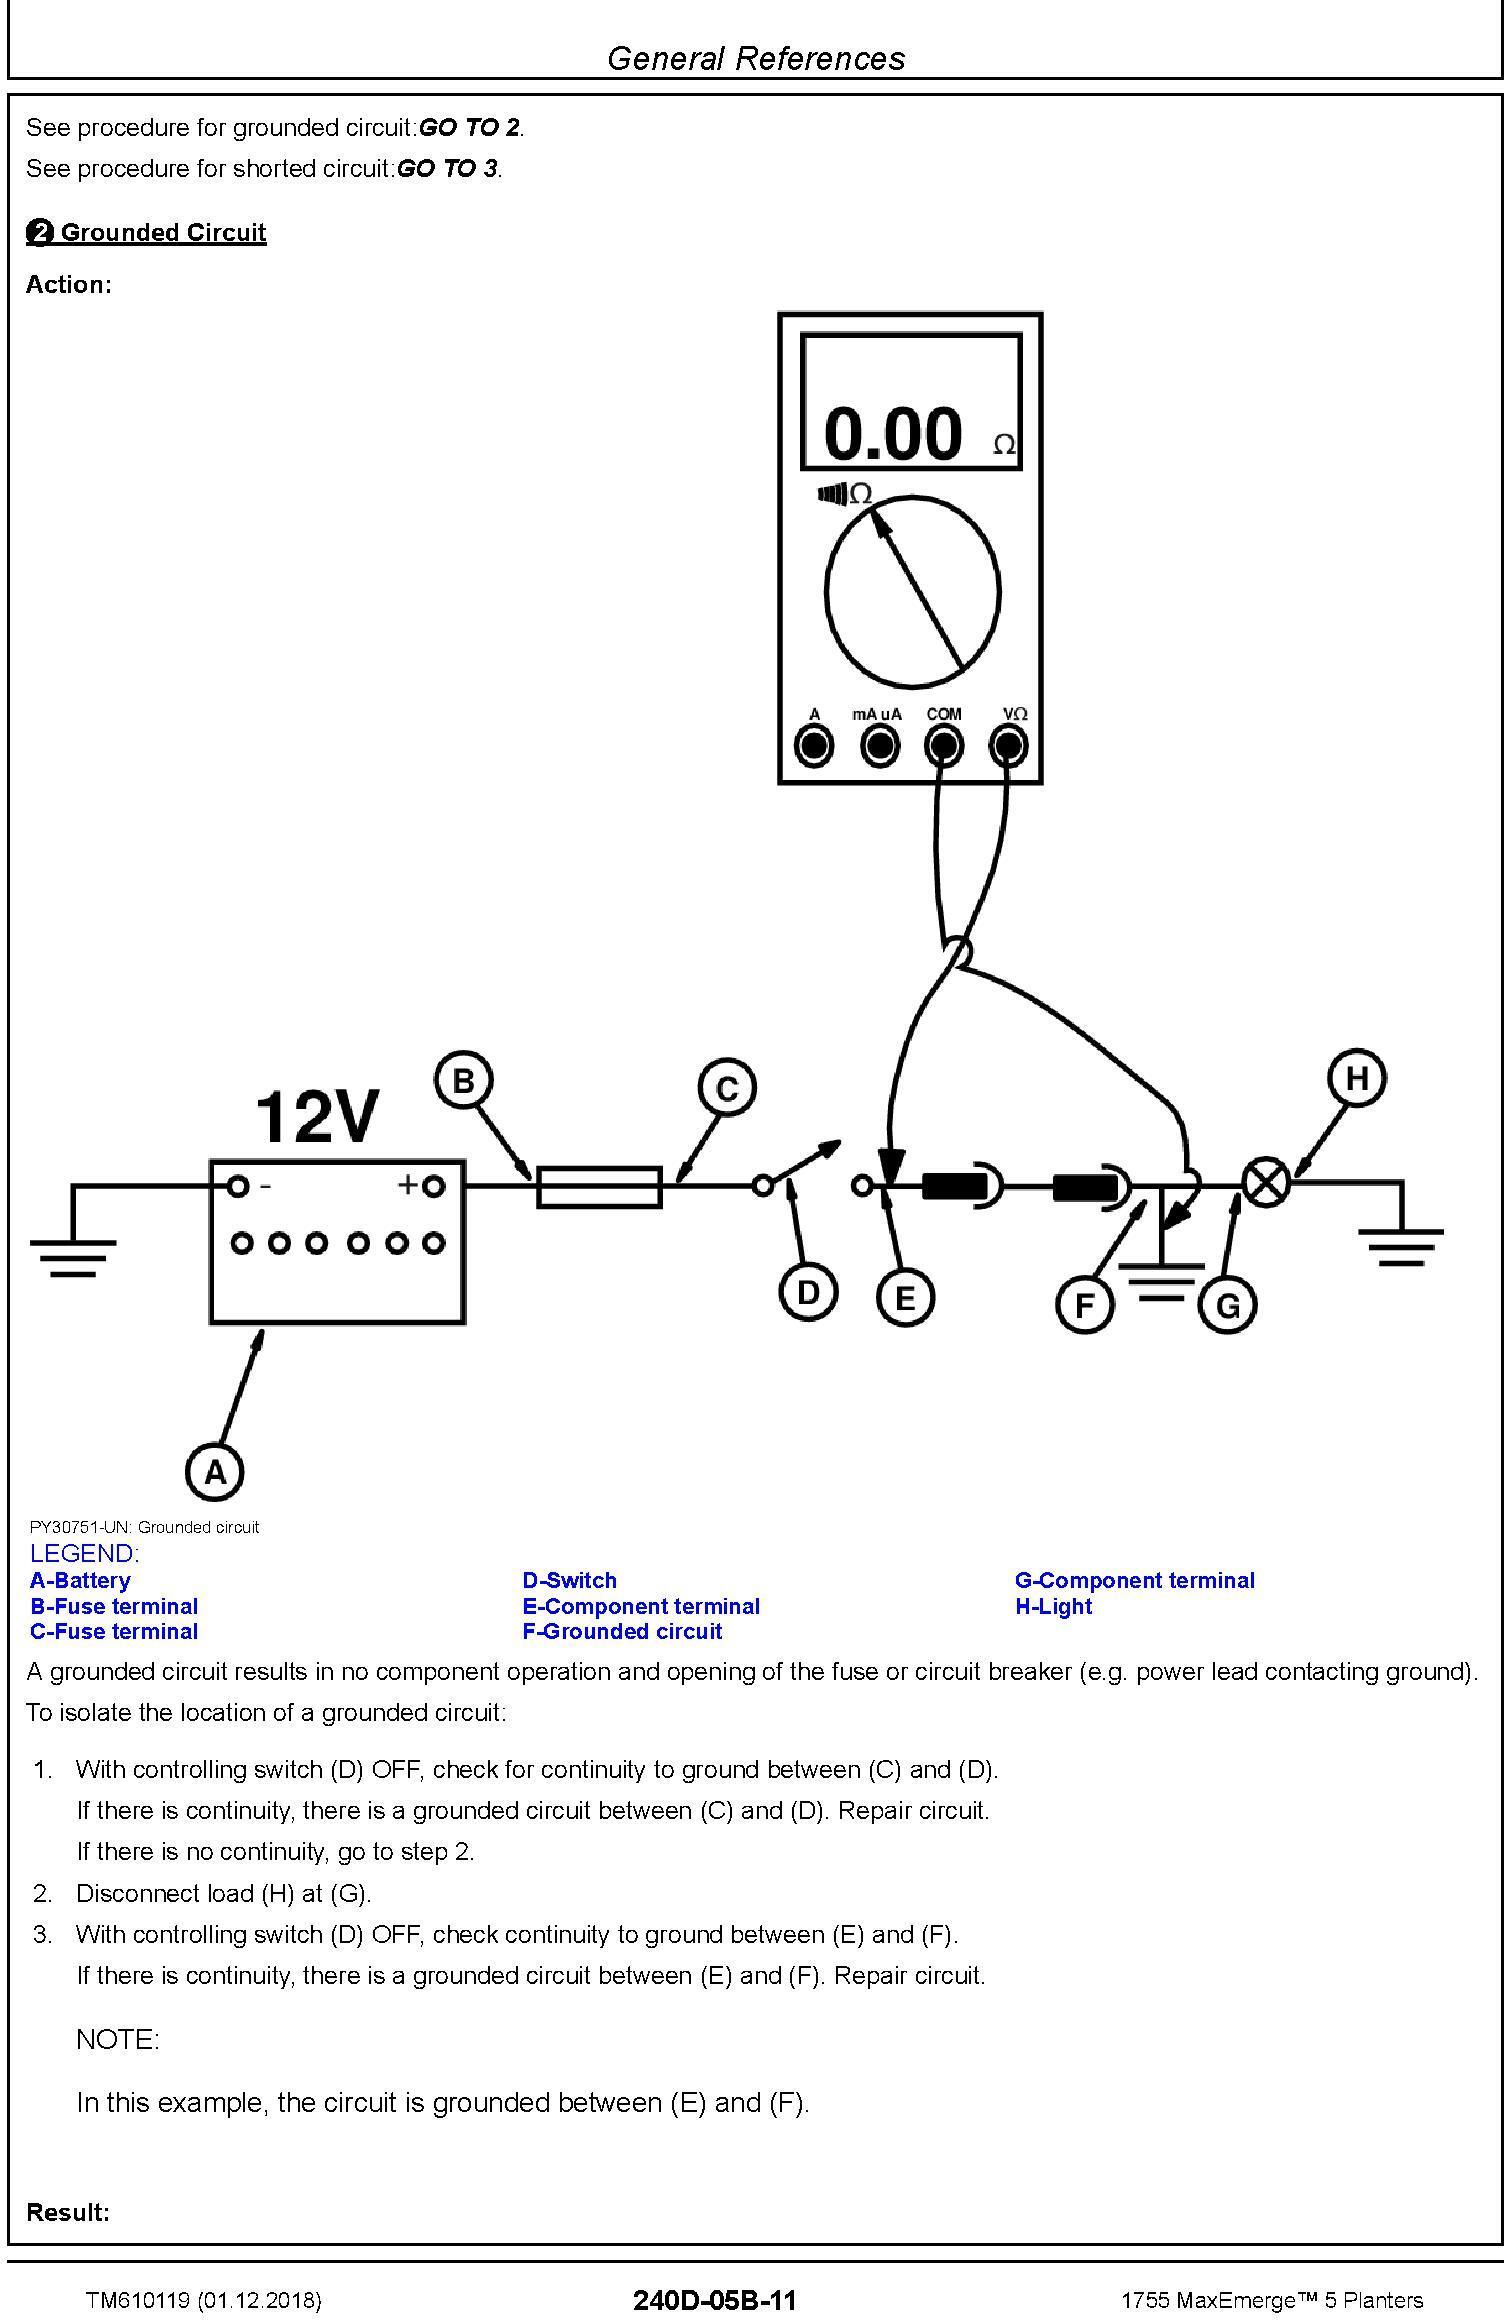 JD John Deere 1755 MaxEmerge 5 Planters Diagnostic Technical Service Manual (TM610119) - 2